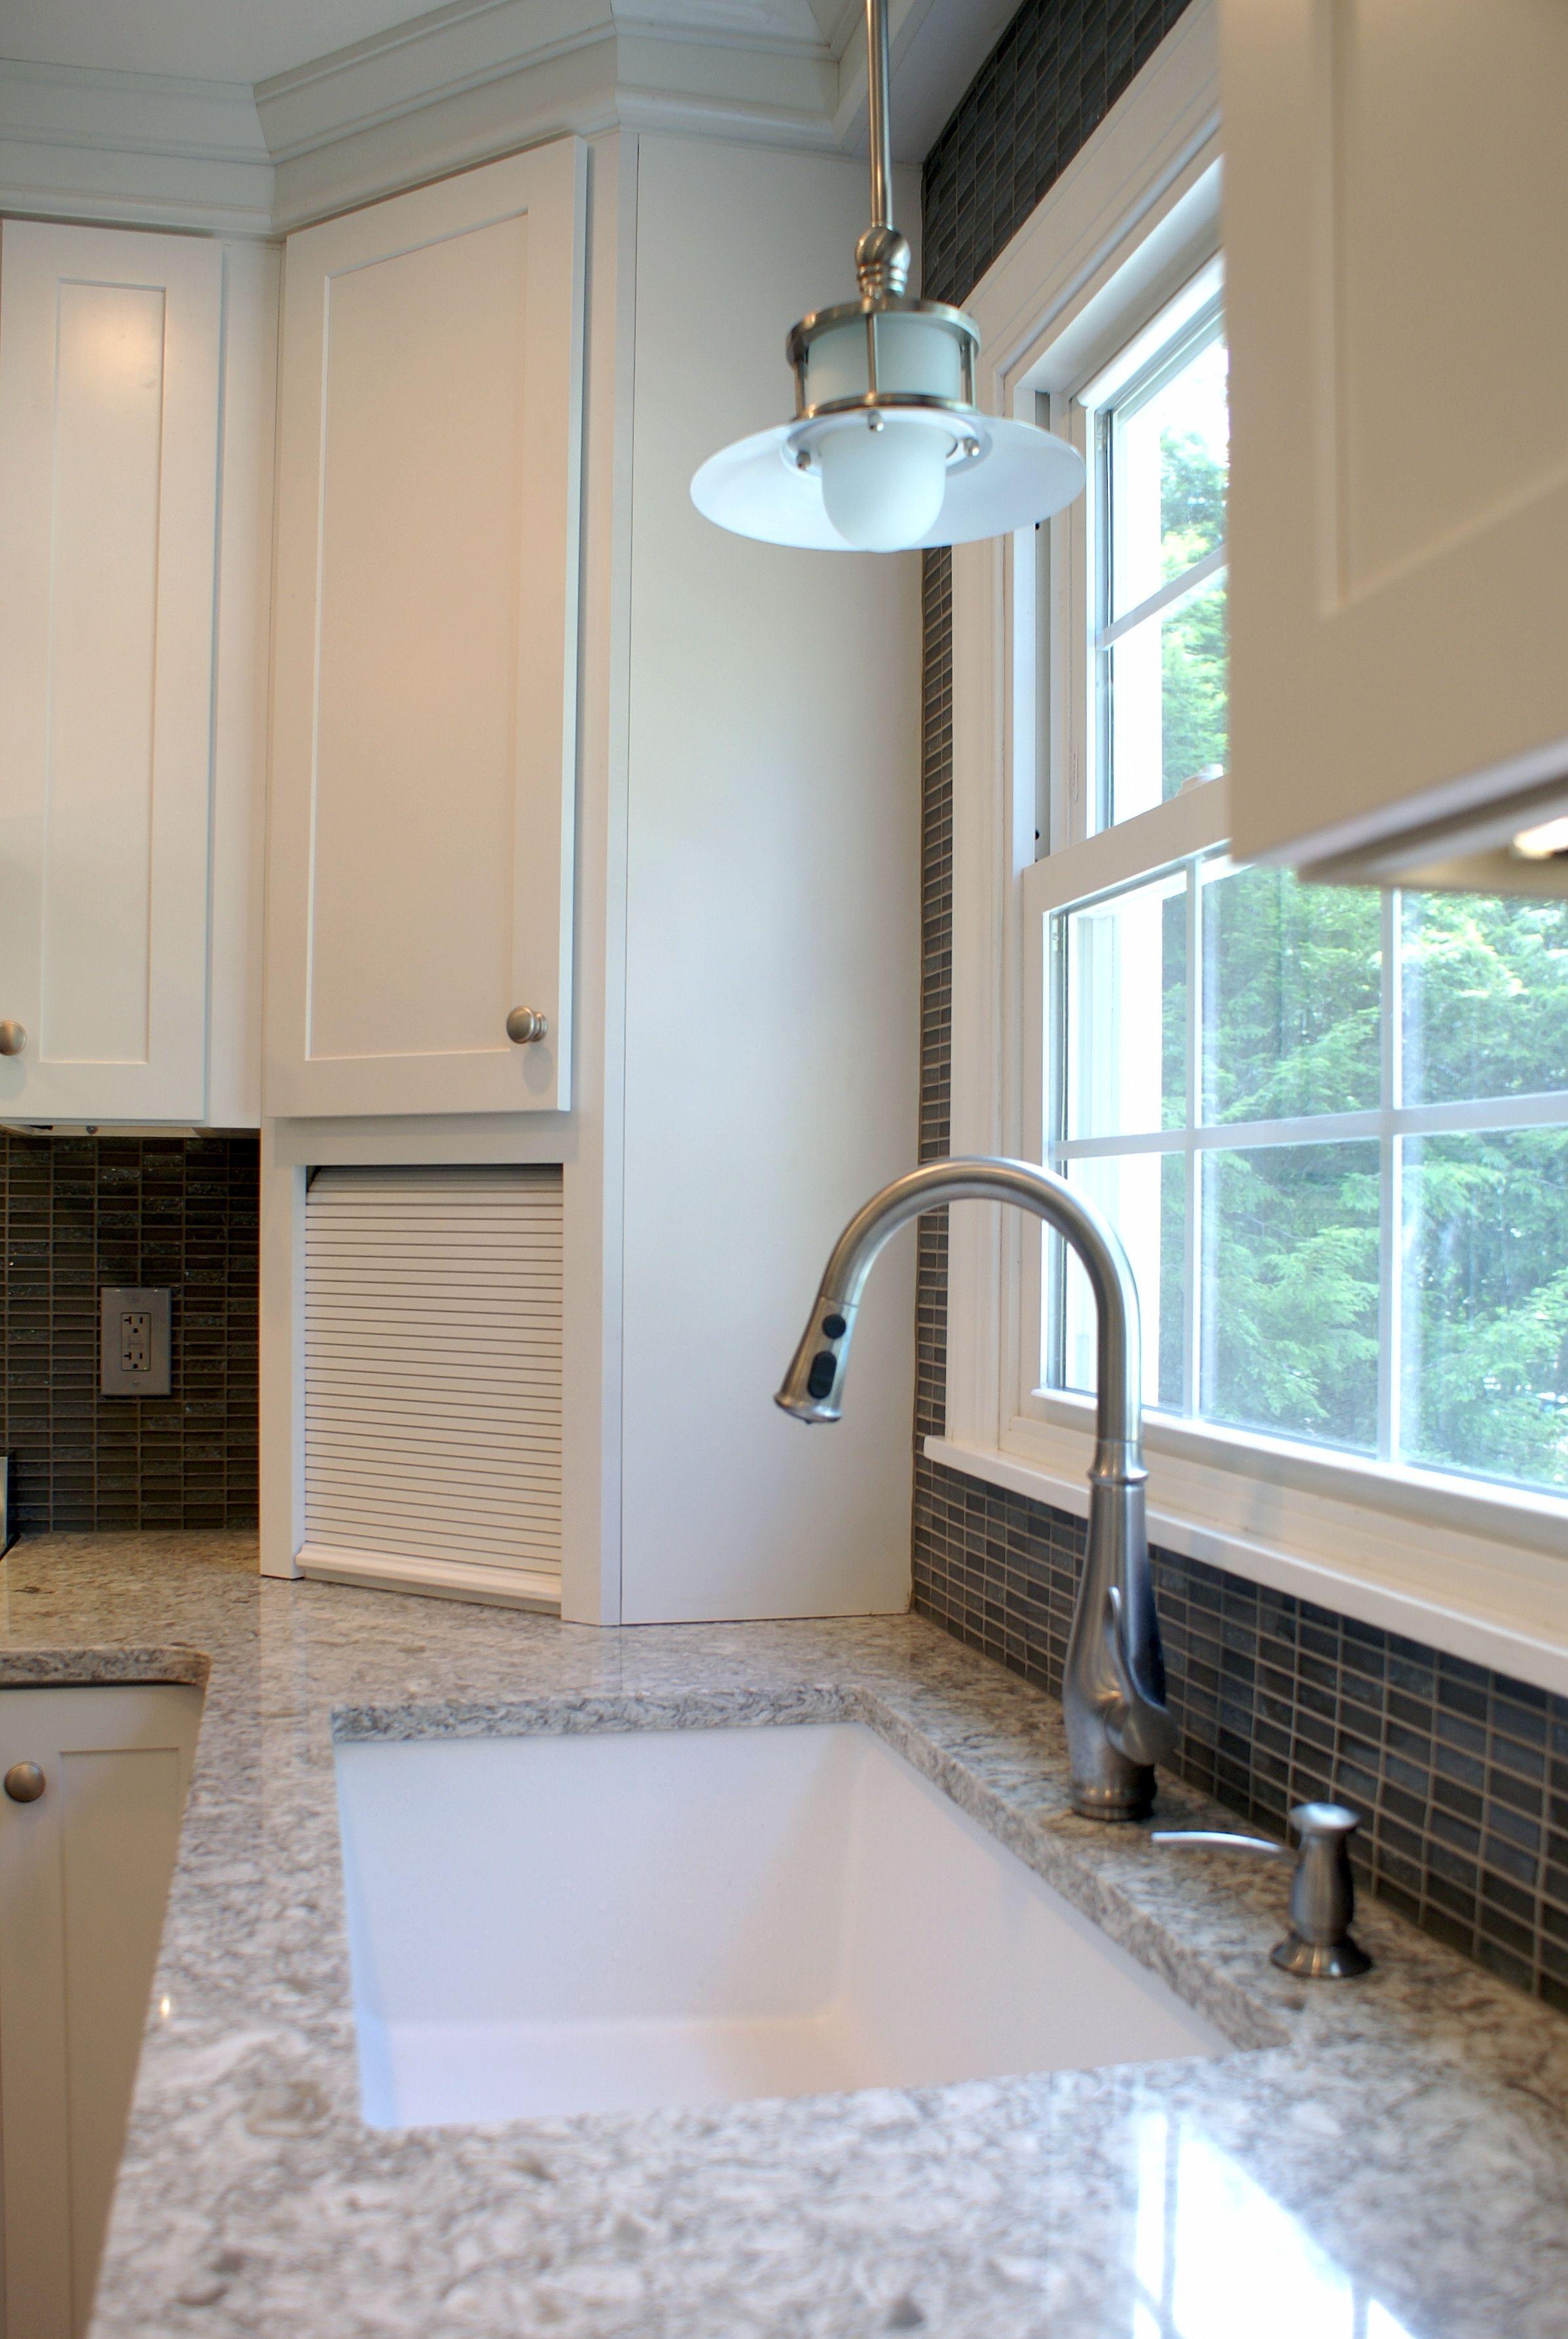 White Diamond Kitchen With New Quay Quartz Countertops 13 Of 15